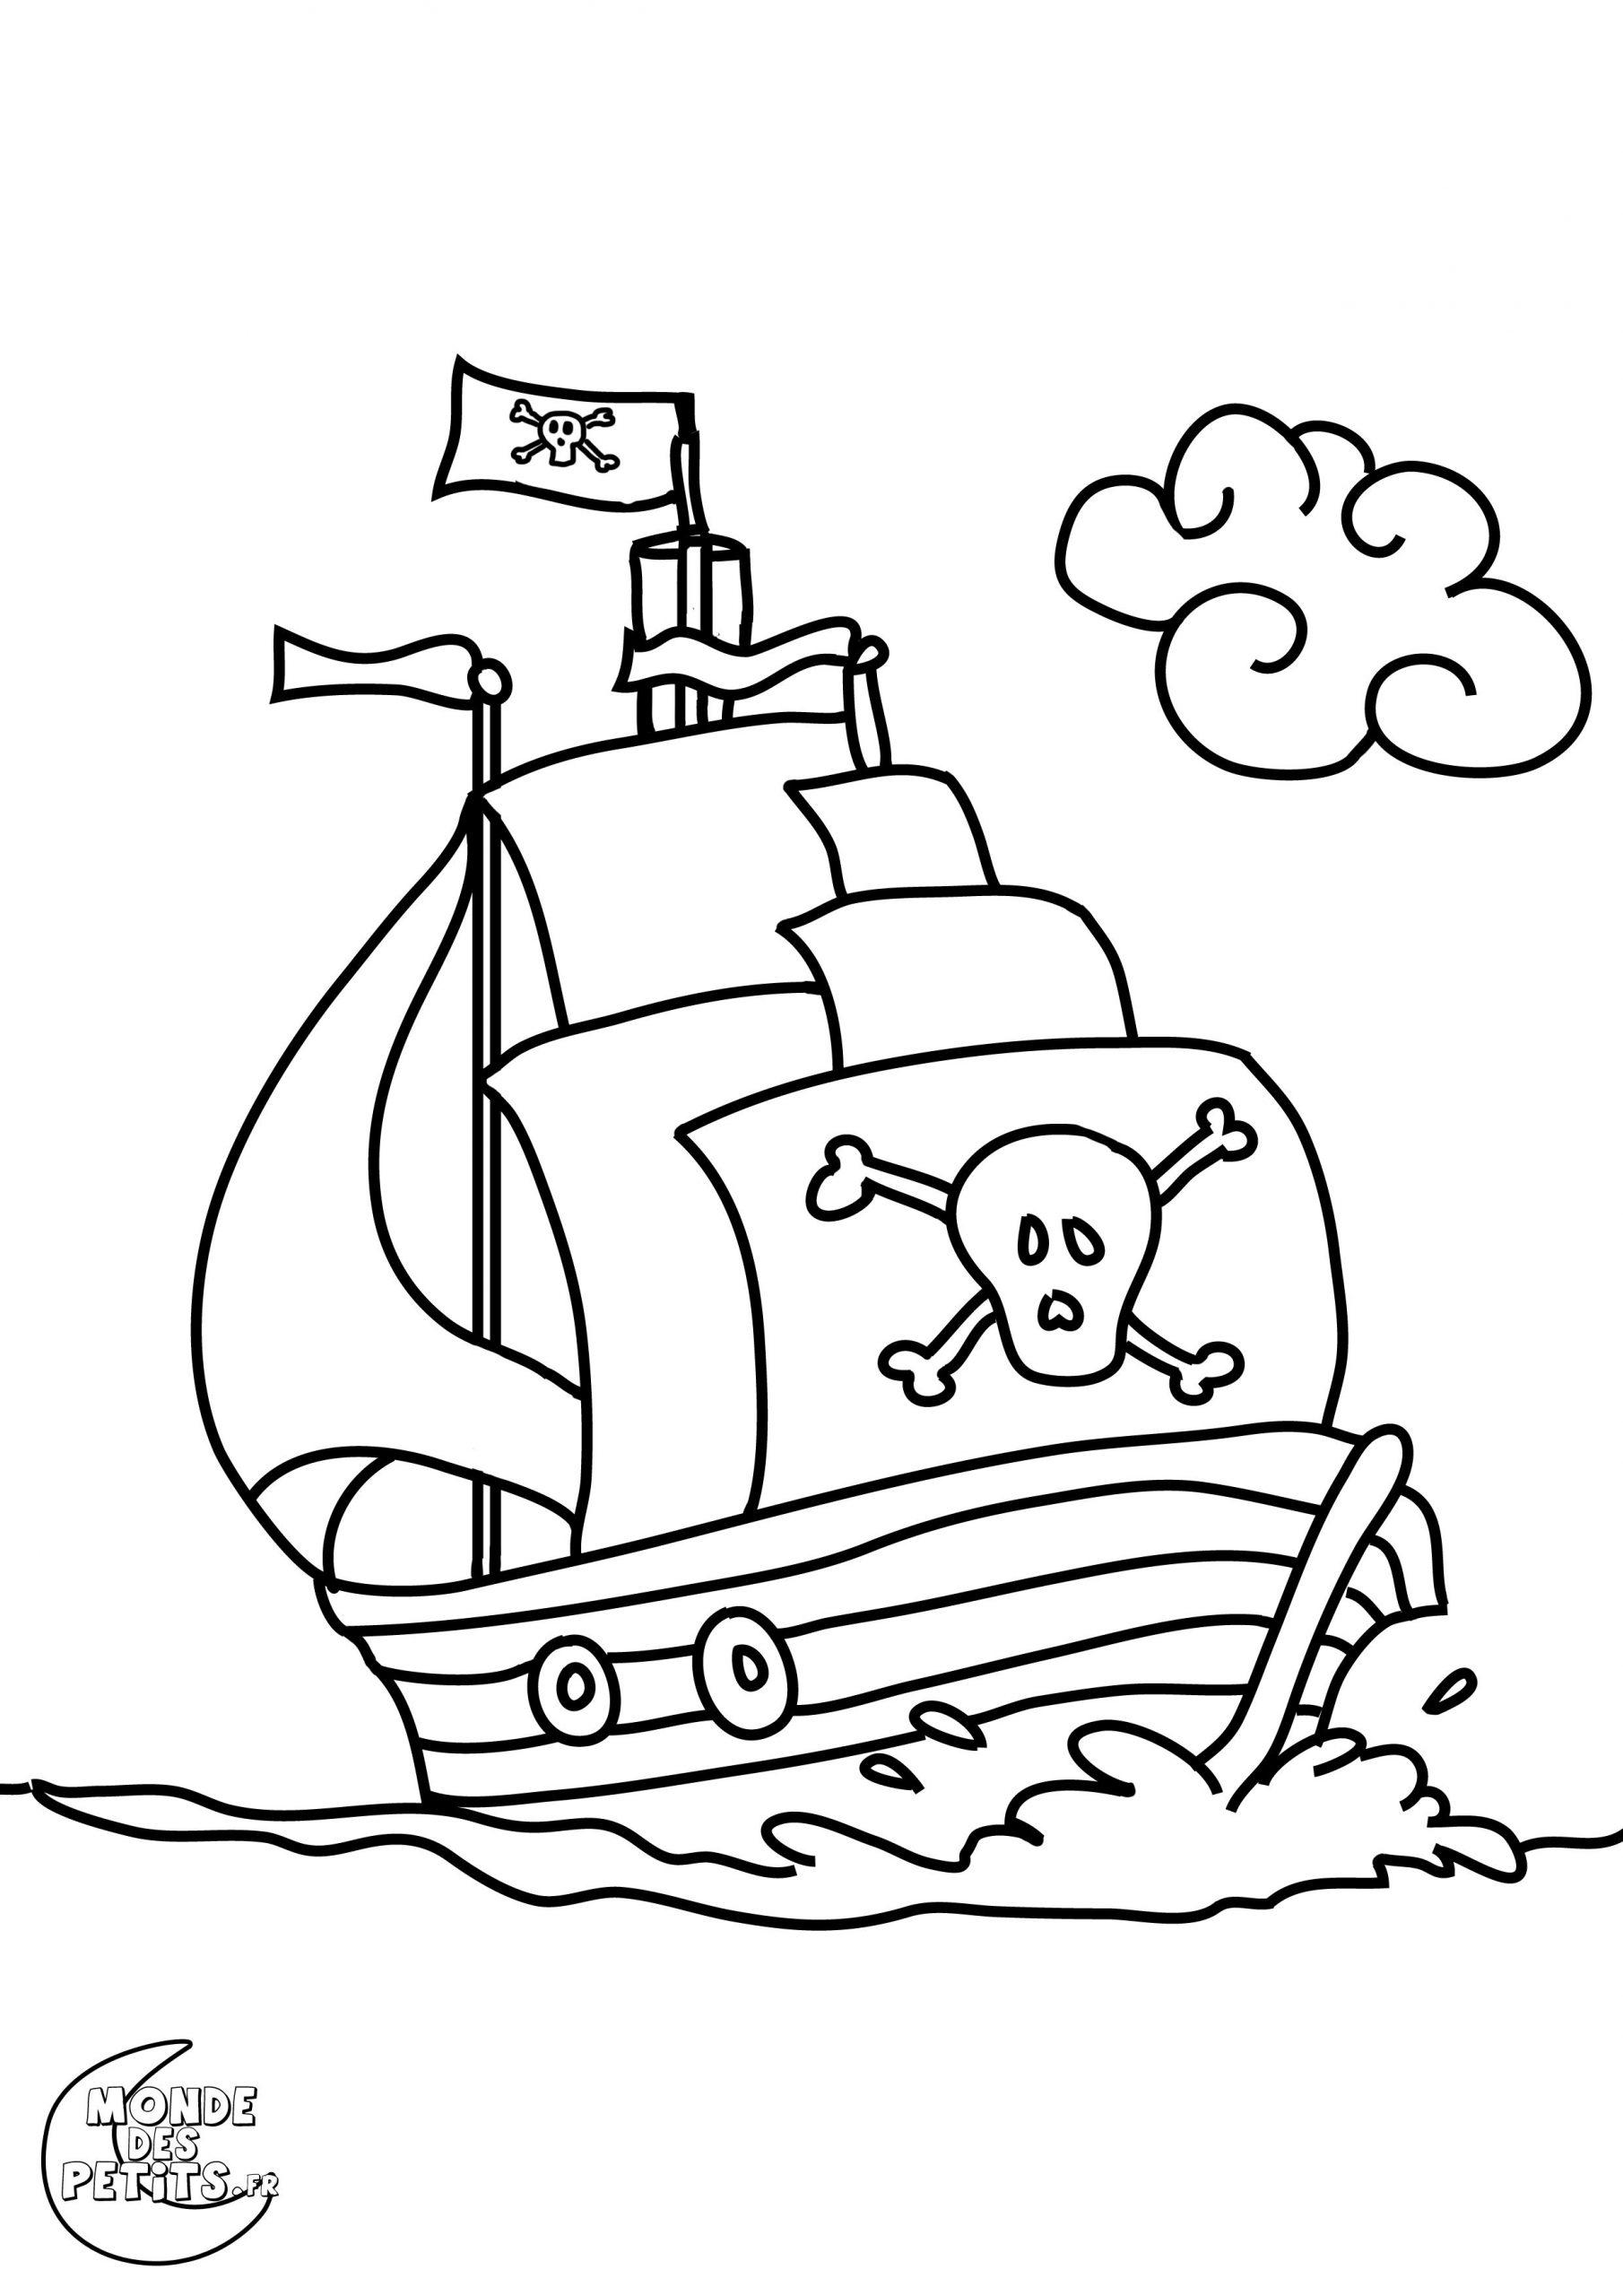 Coloriage Pirate À Colorier - Dessin À Imprimer | Coloriage destiné Dessin A Imprimer De Pirate